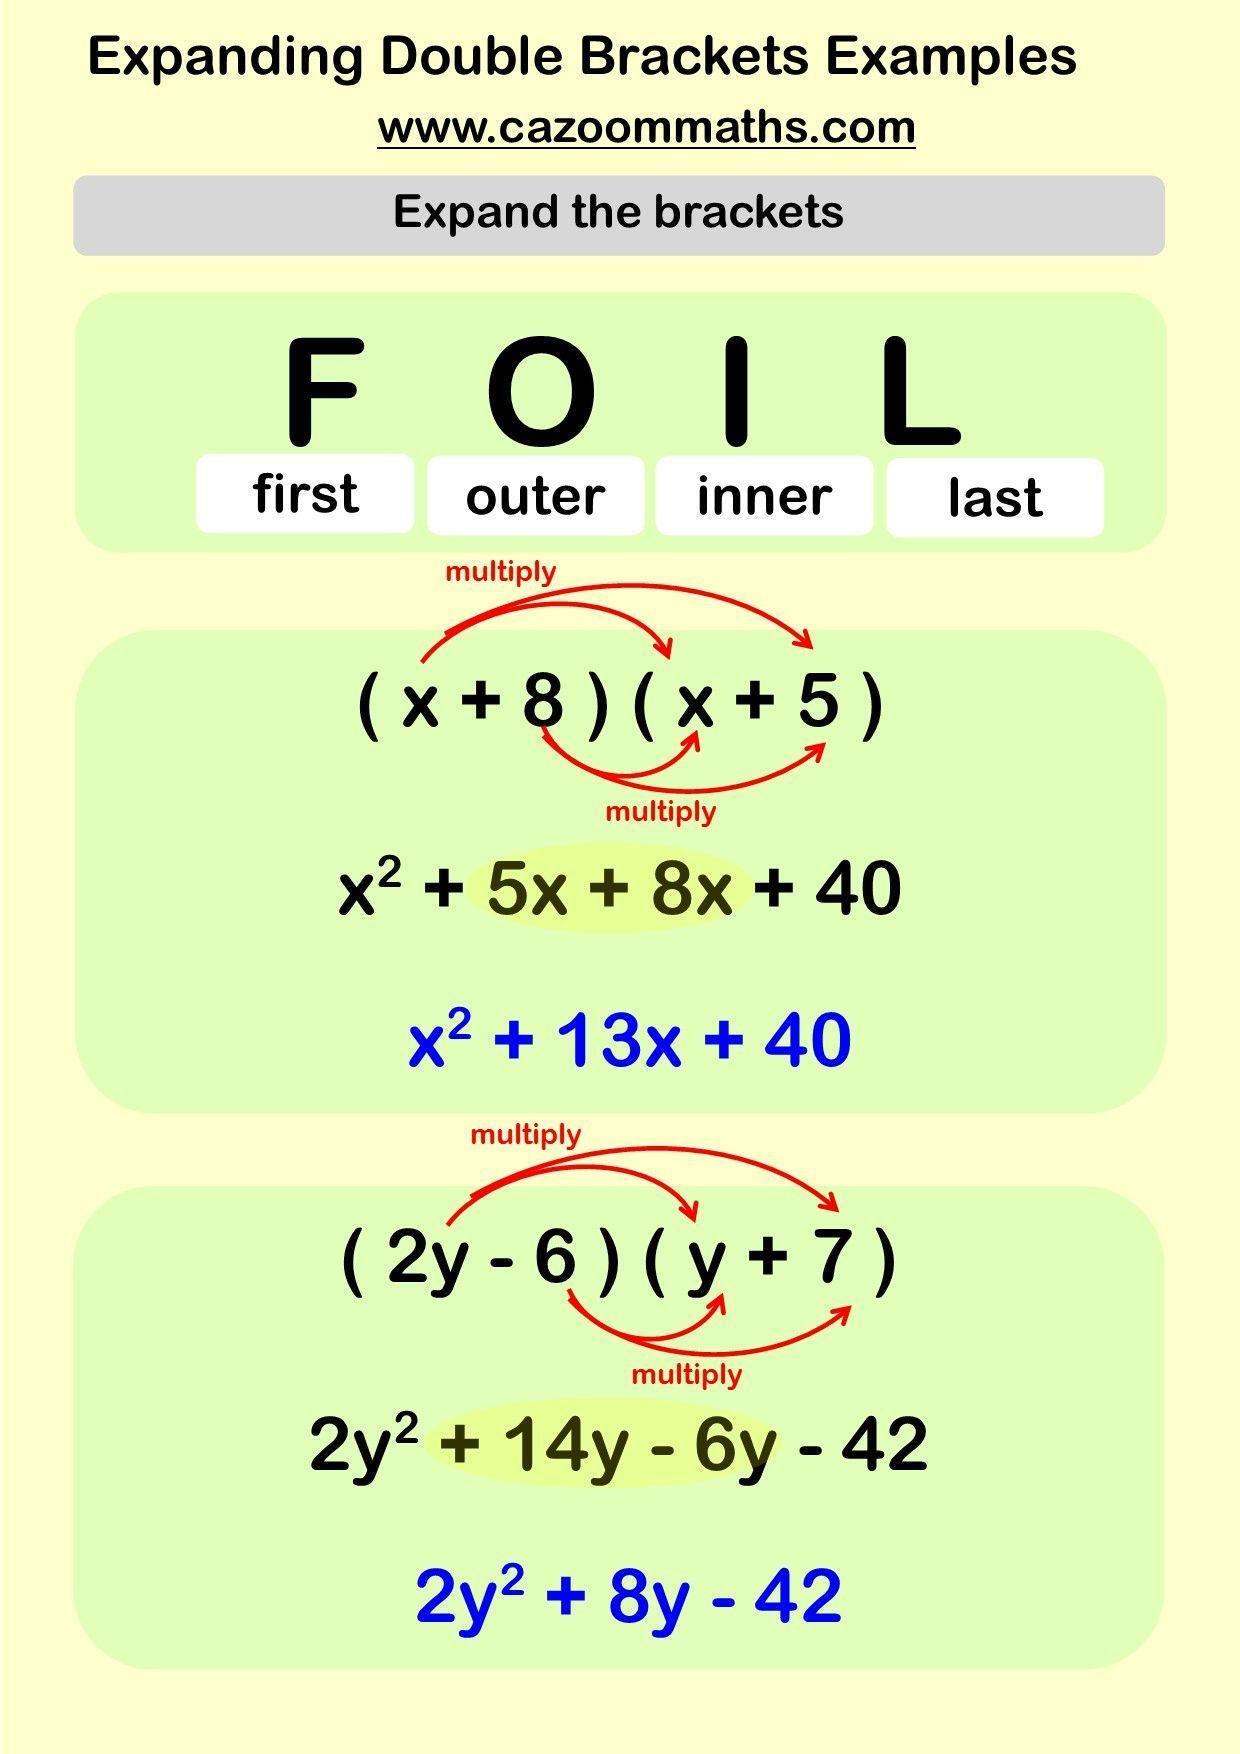 Single Brackets Teaching Resource Learnmathonline Math Methods Learning Mathematics Studying Math